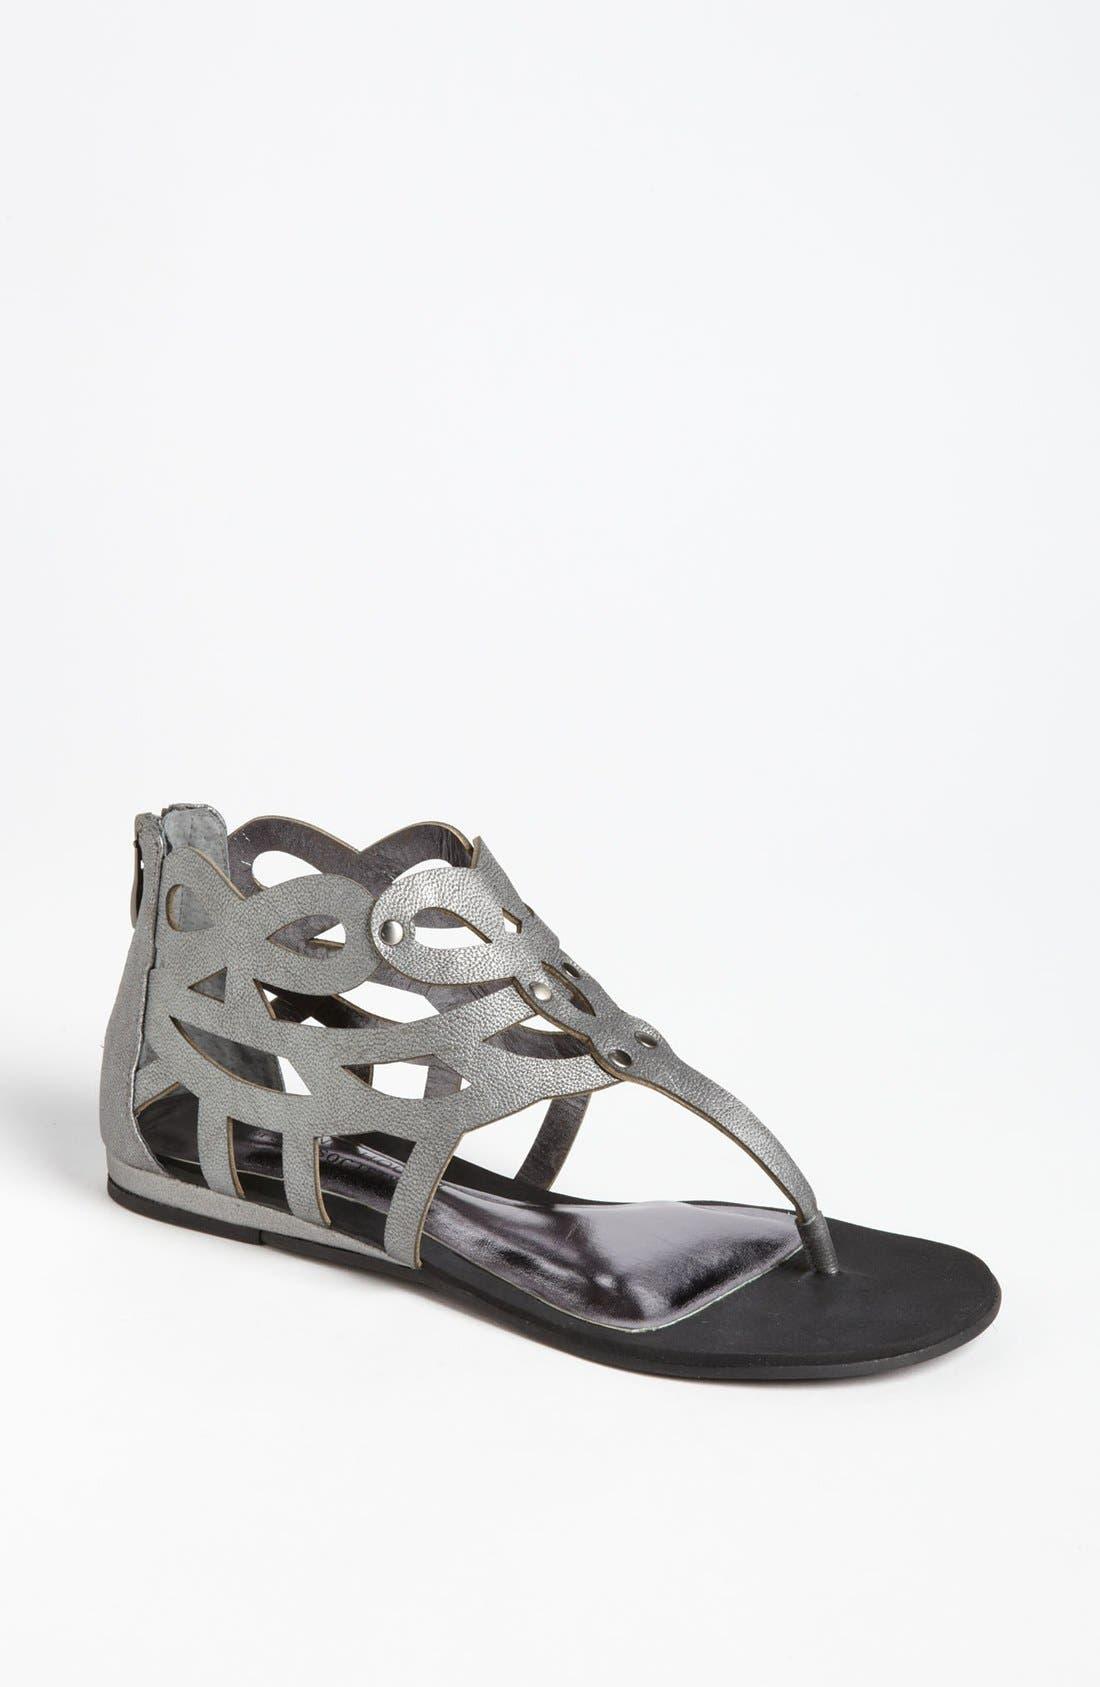 Alternate Image 1 Selected - Julianne Hough for Sole Society 'Kinsley' Sandal